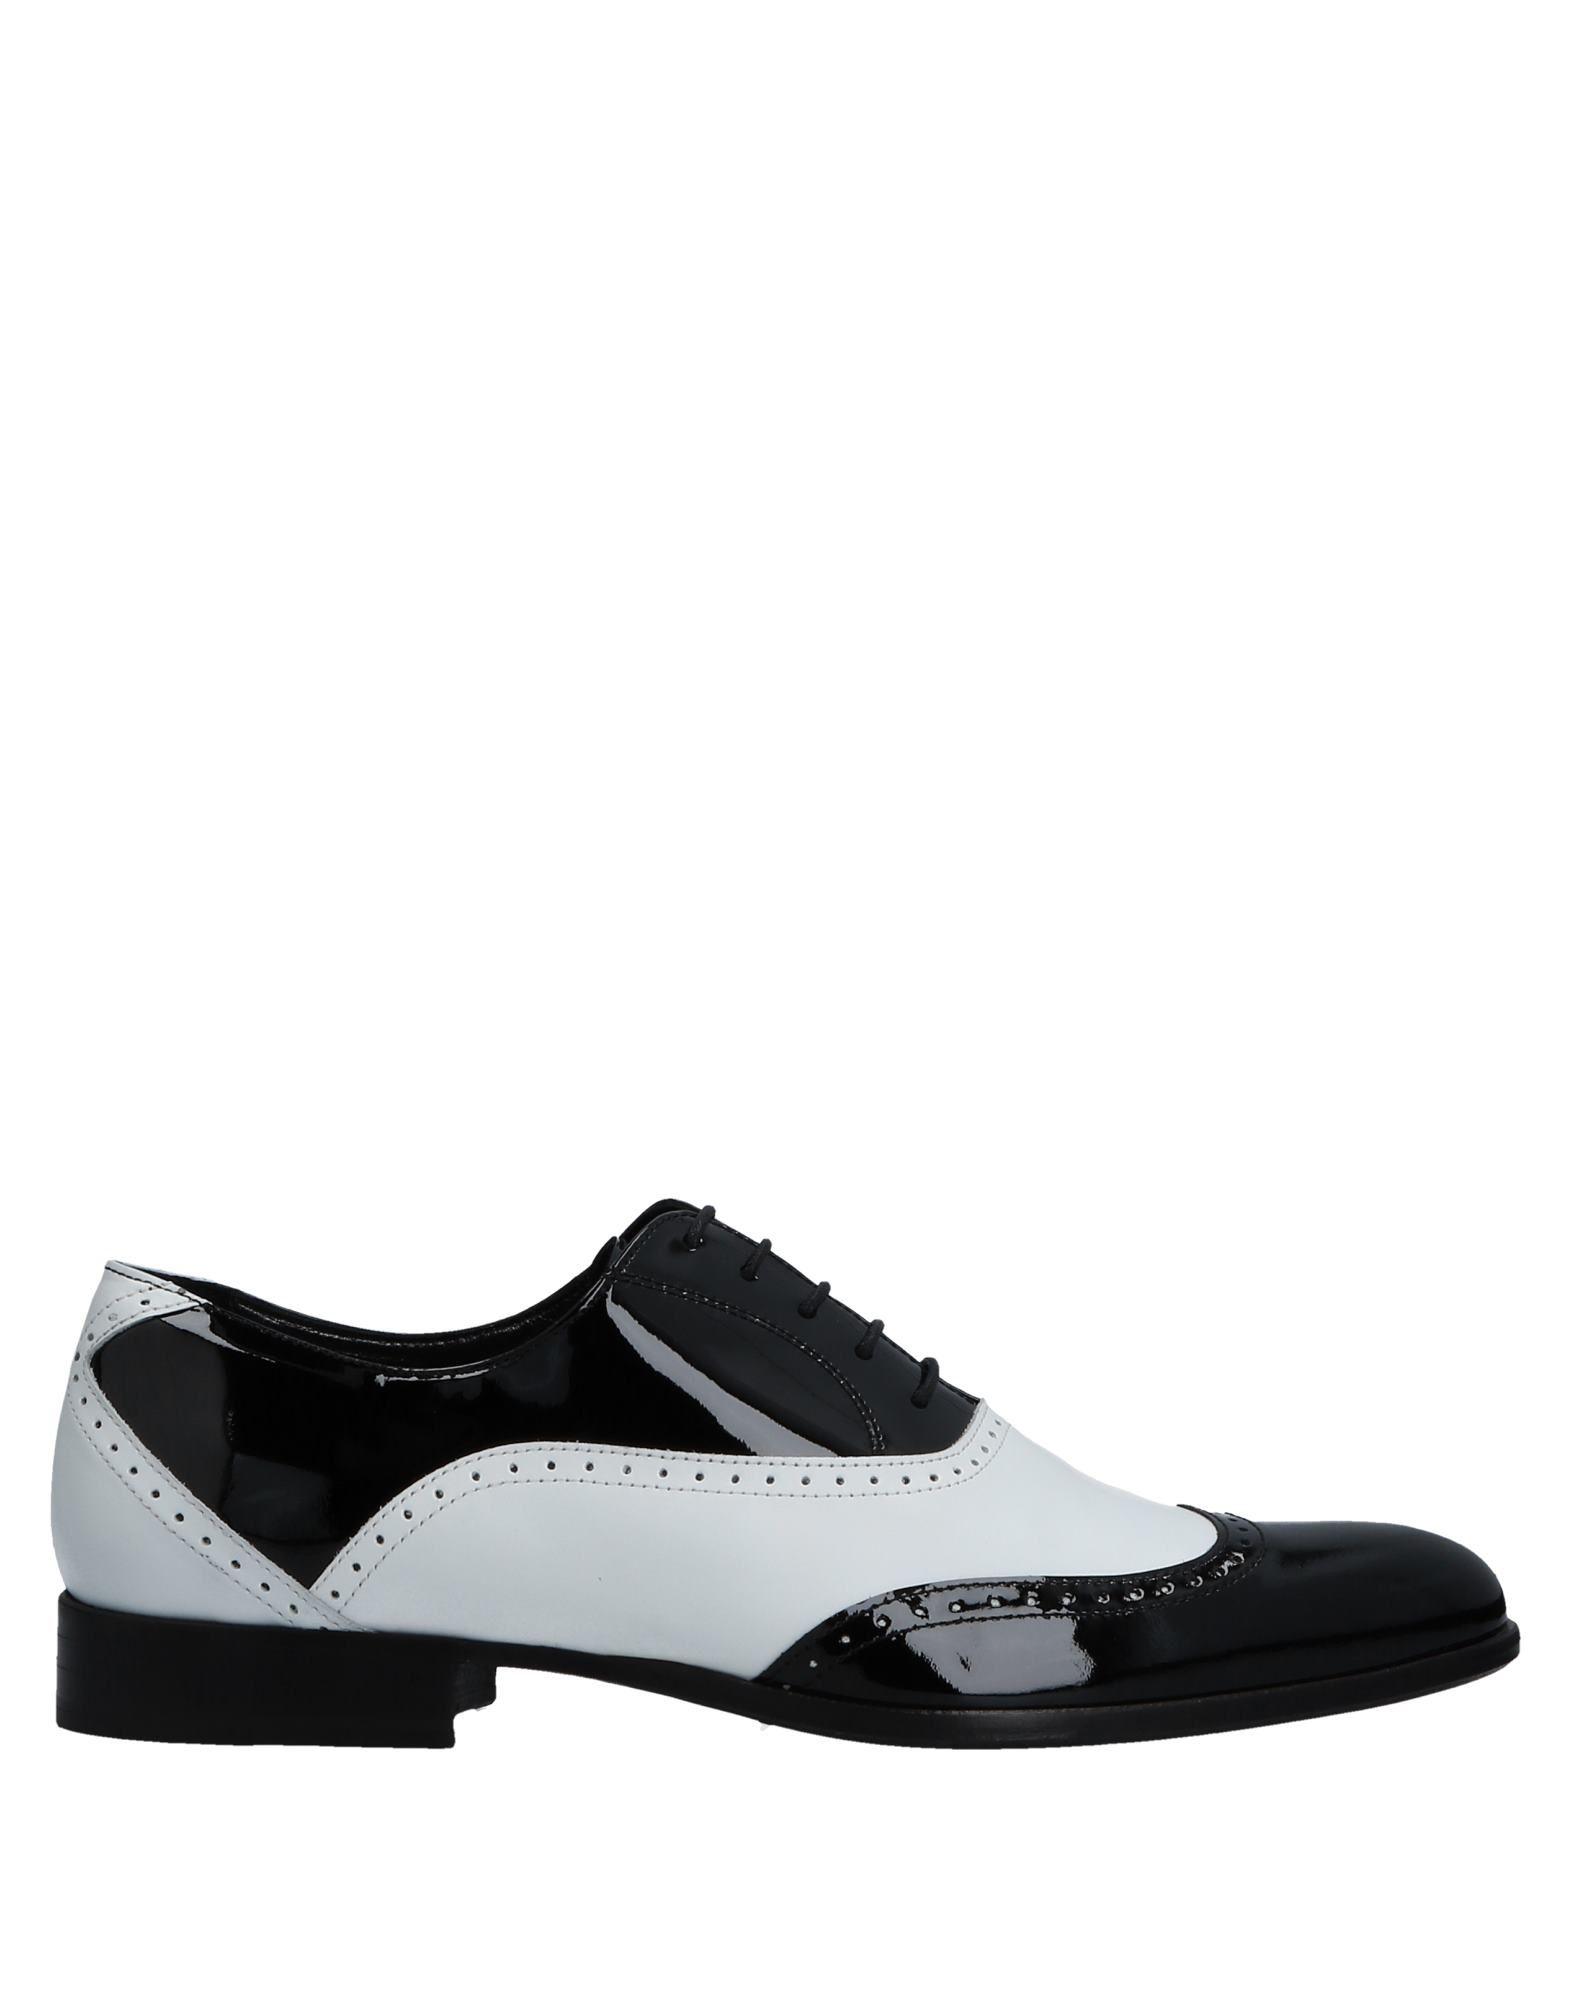 Principe Di Milano Schnürschuhe Herren  11531496KG Gute Qualität beliebte Schuhe